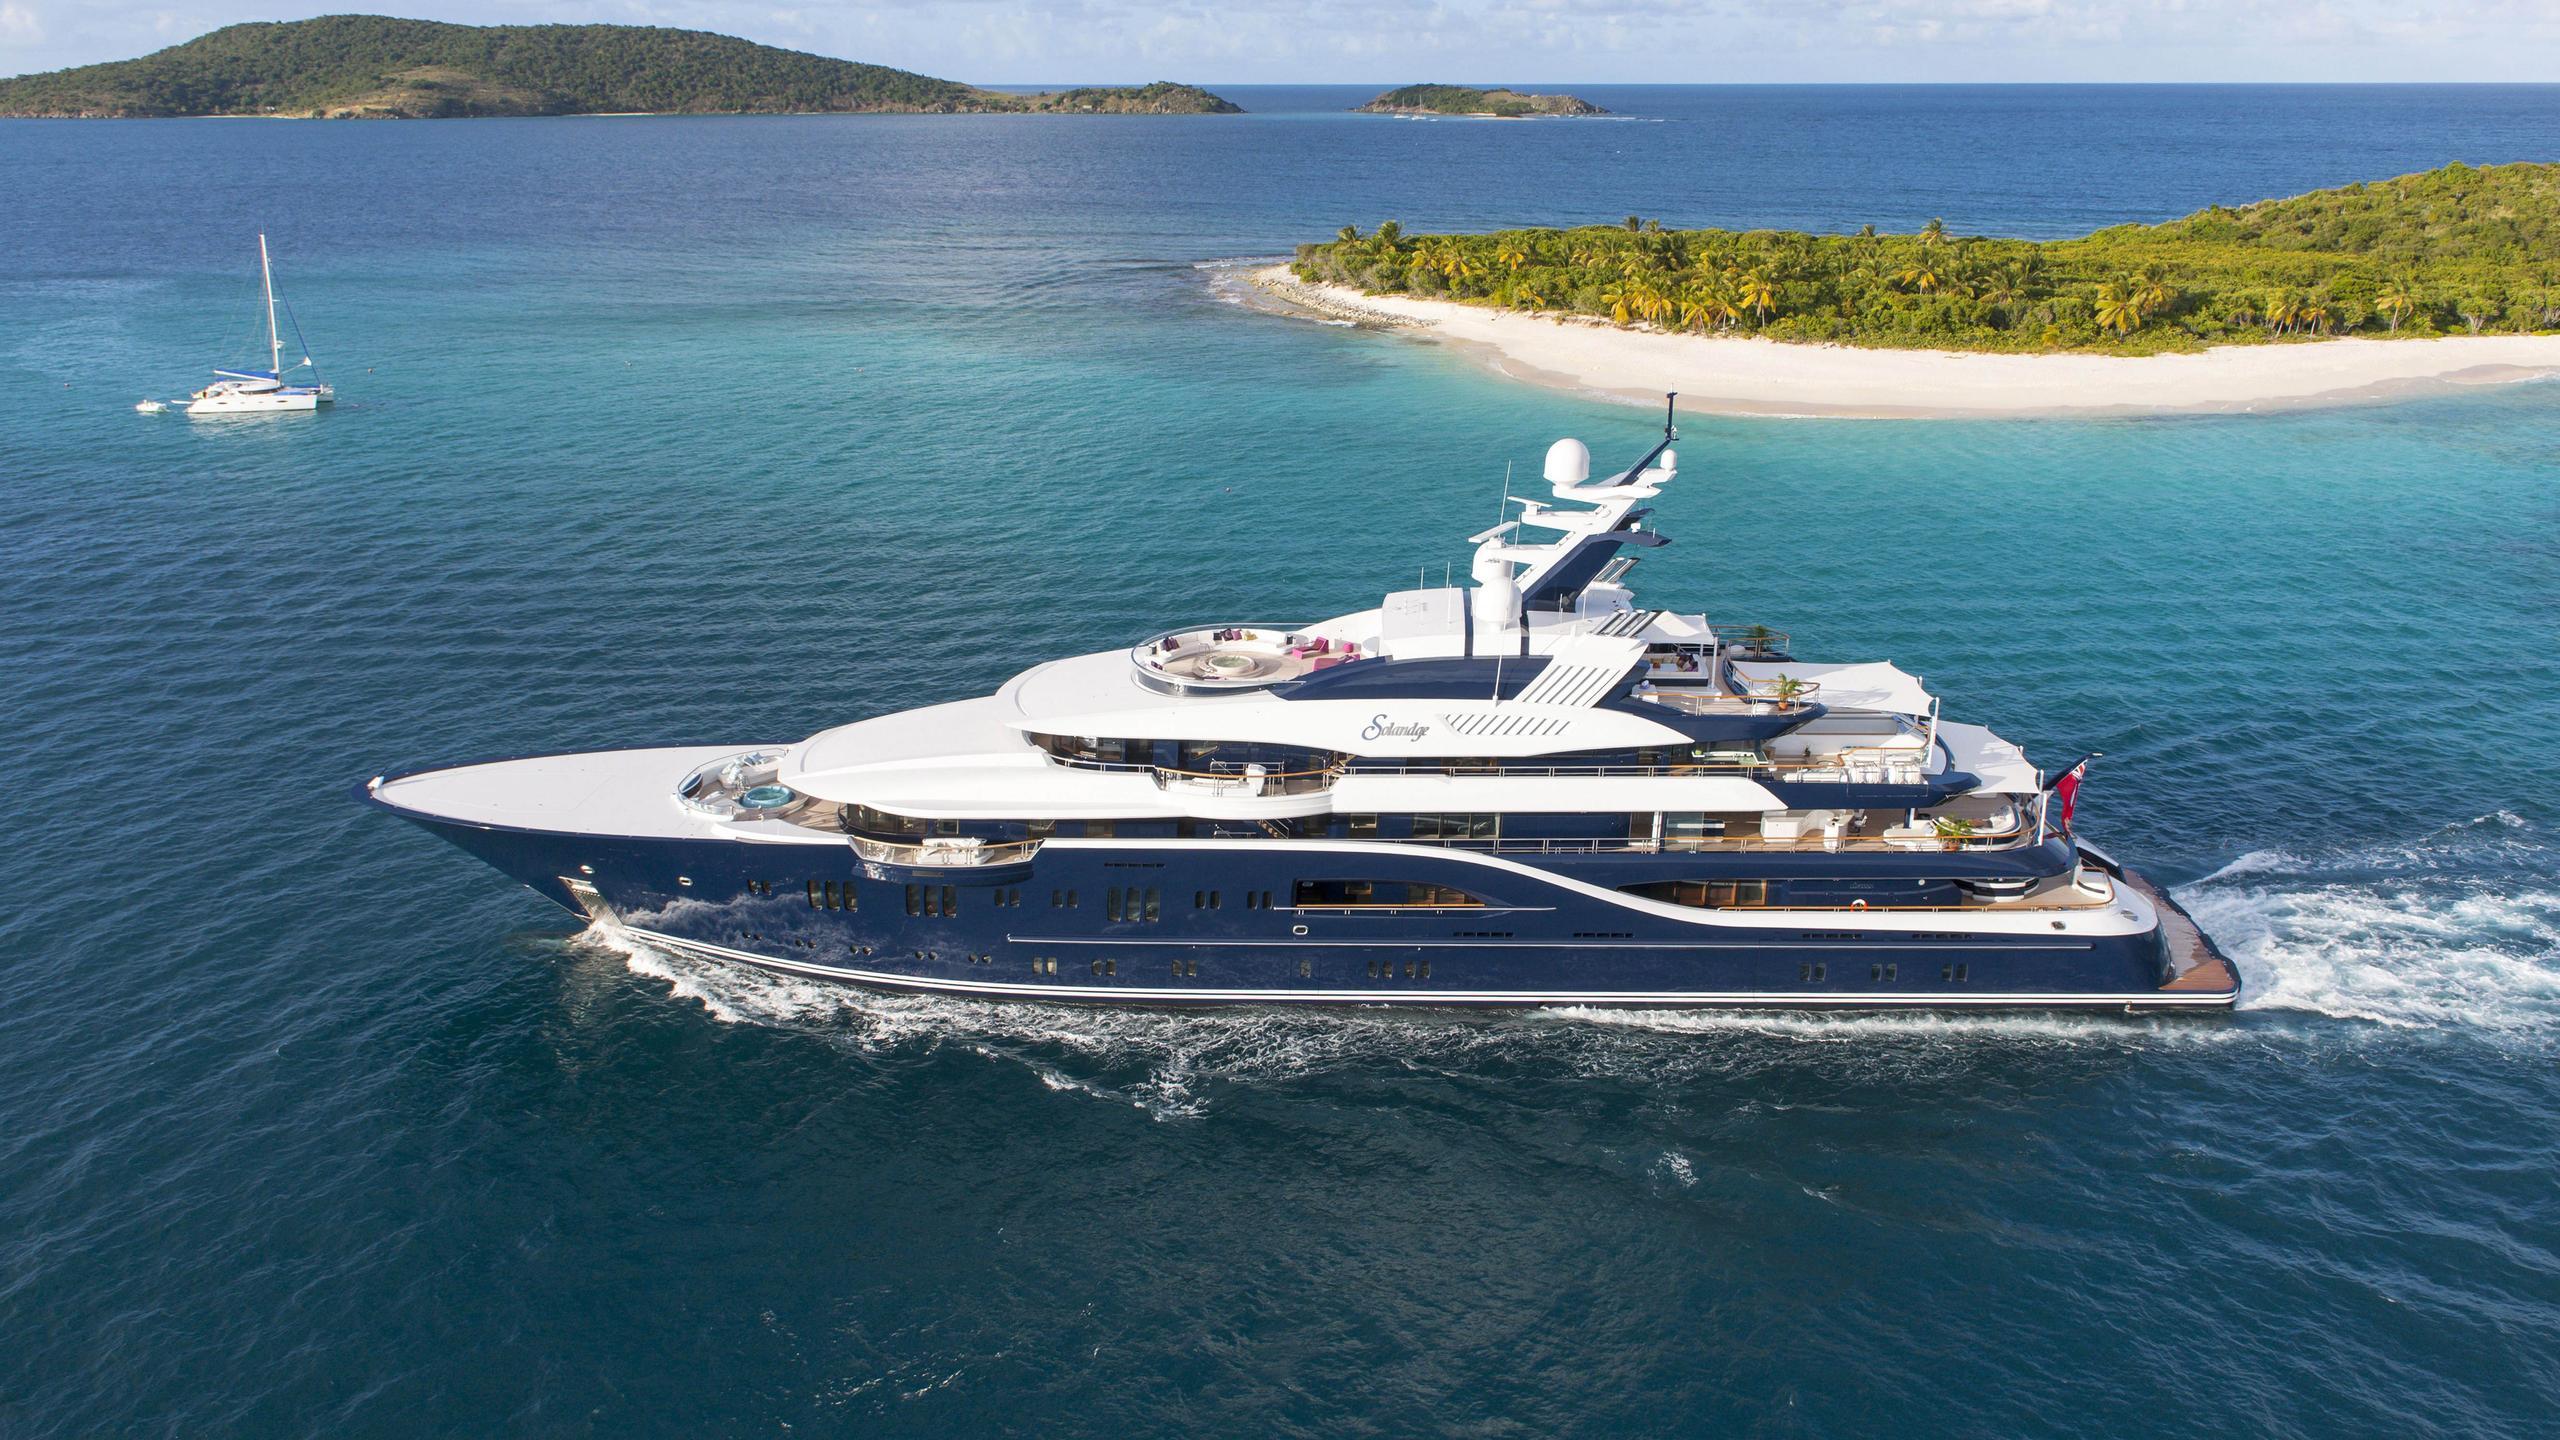 solandge-motor-yacht-lurssen-2013-85m-profile-cruising